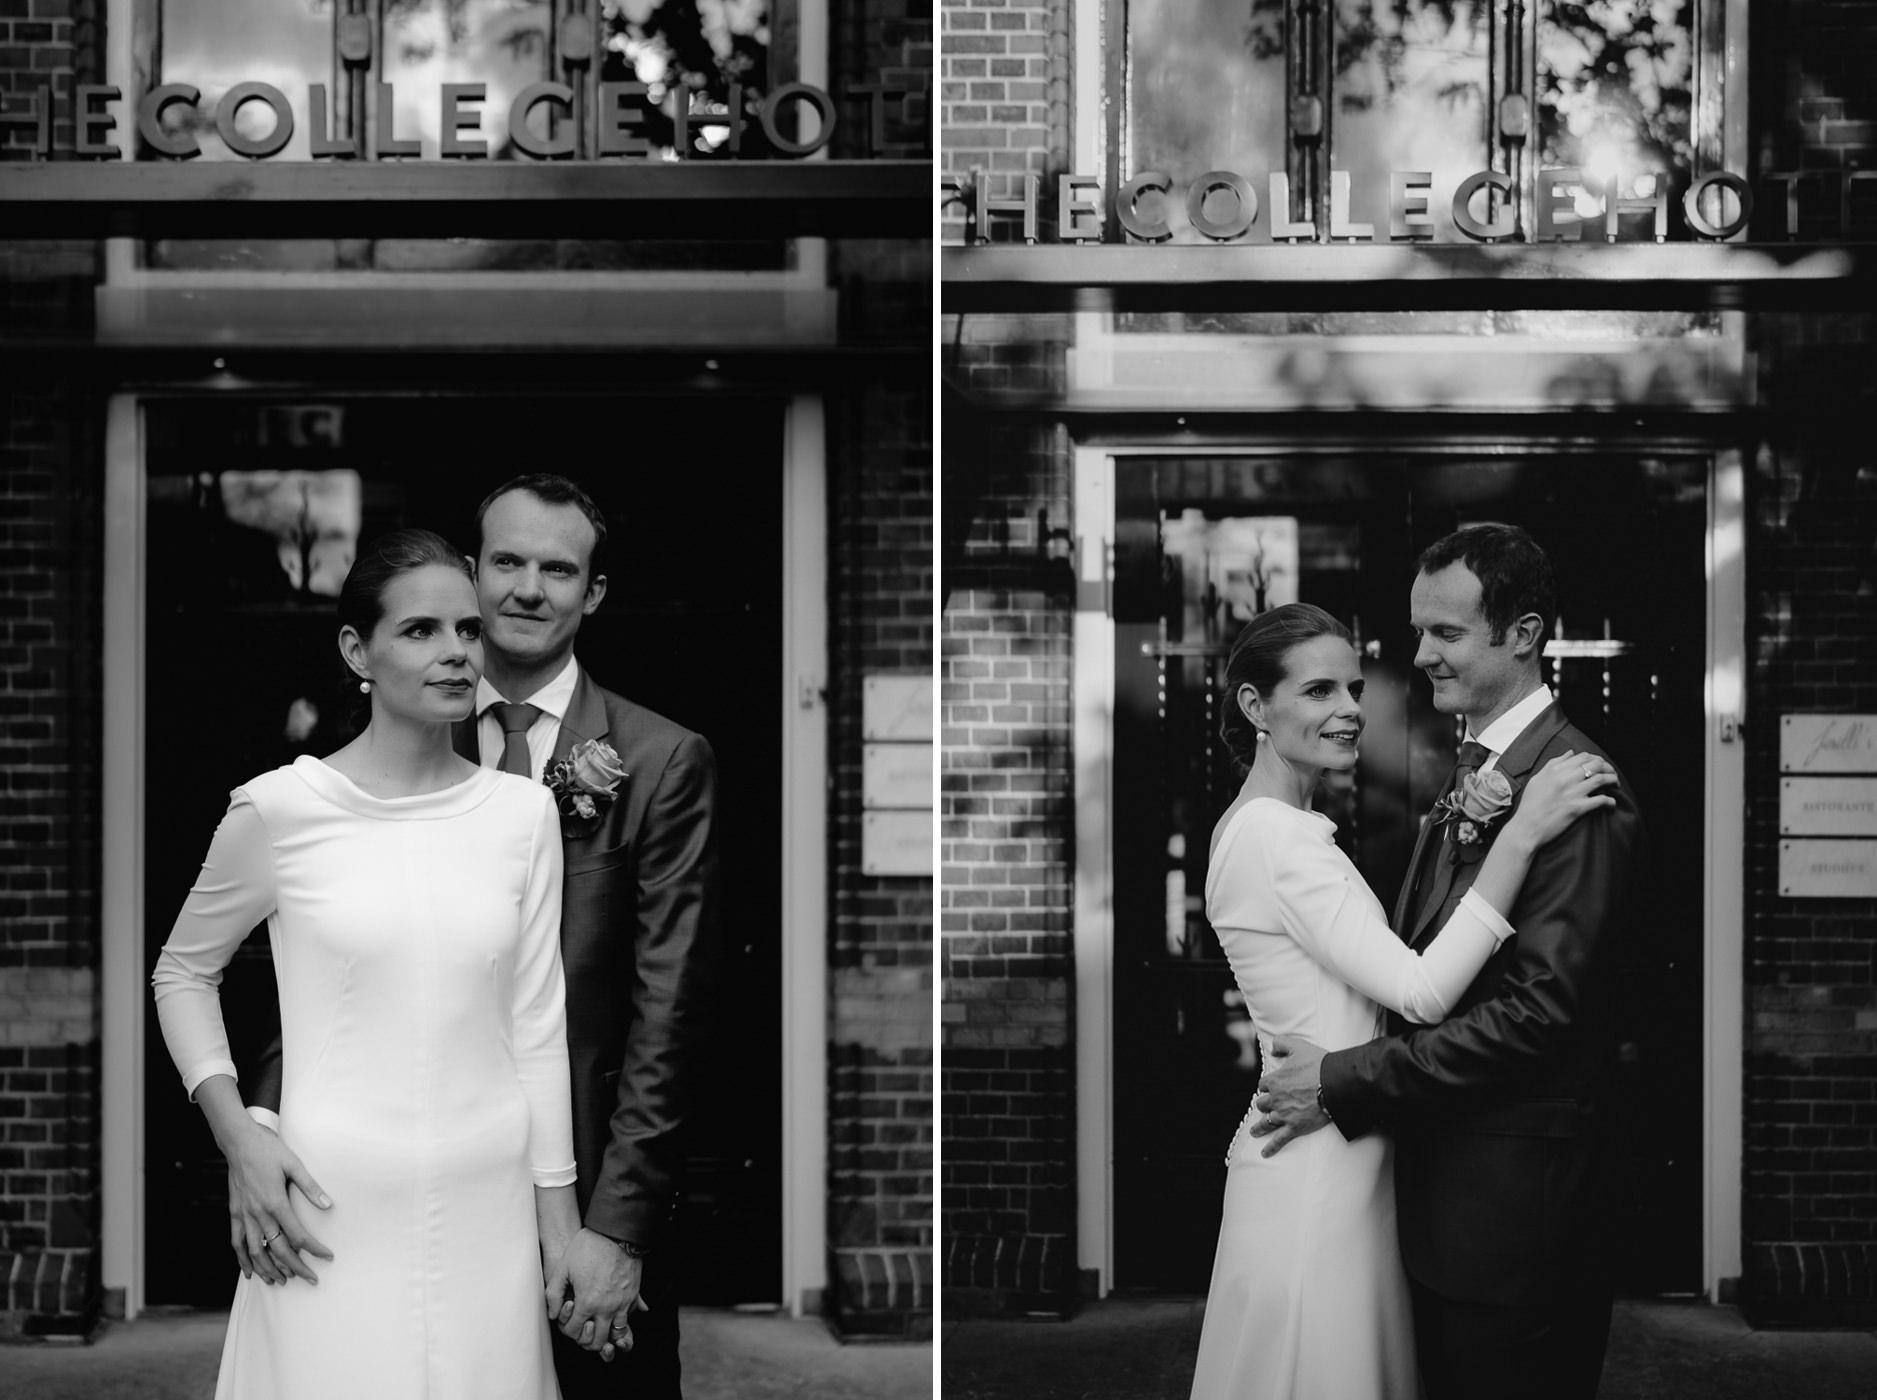 bruidsfotografie-trouwfotograaf-wedding-photographer-amsterdam-James-Jantine-248-2 copy 2.jpg